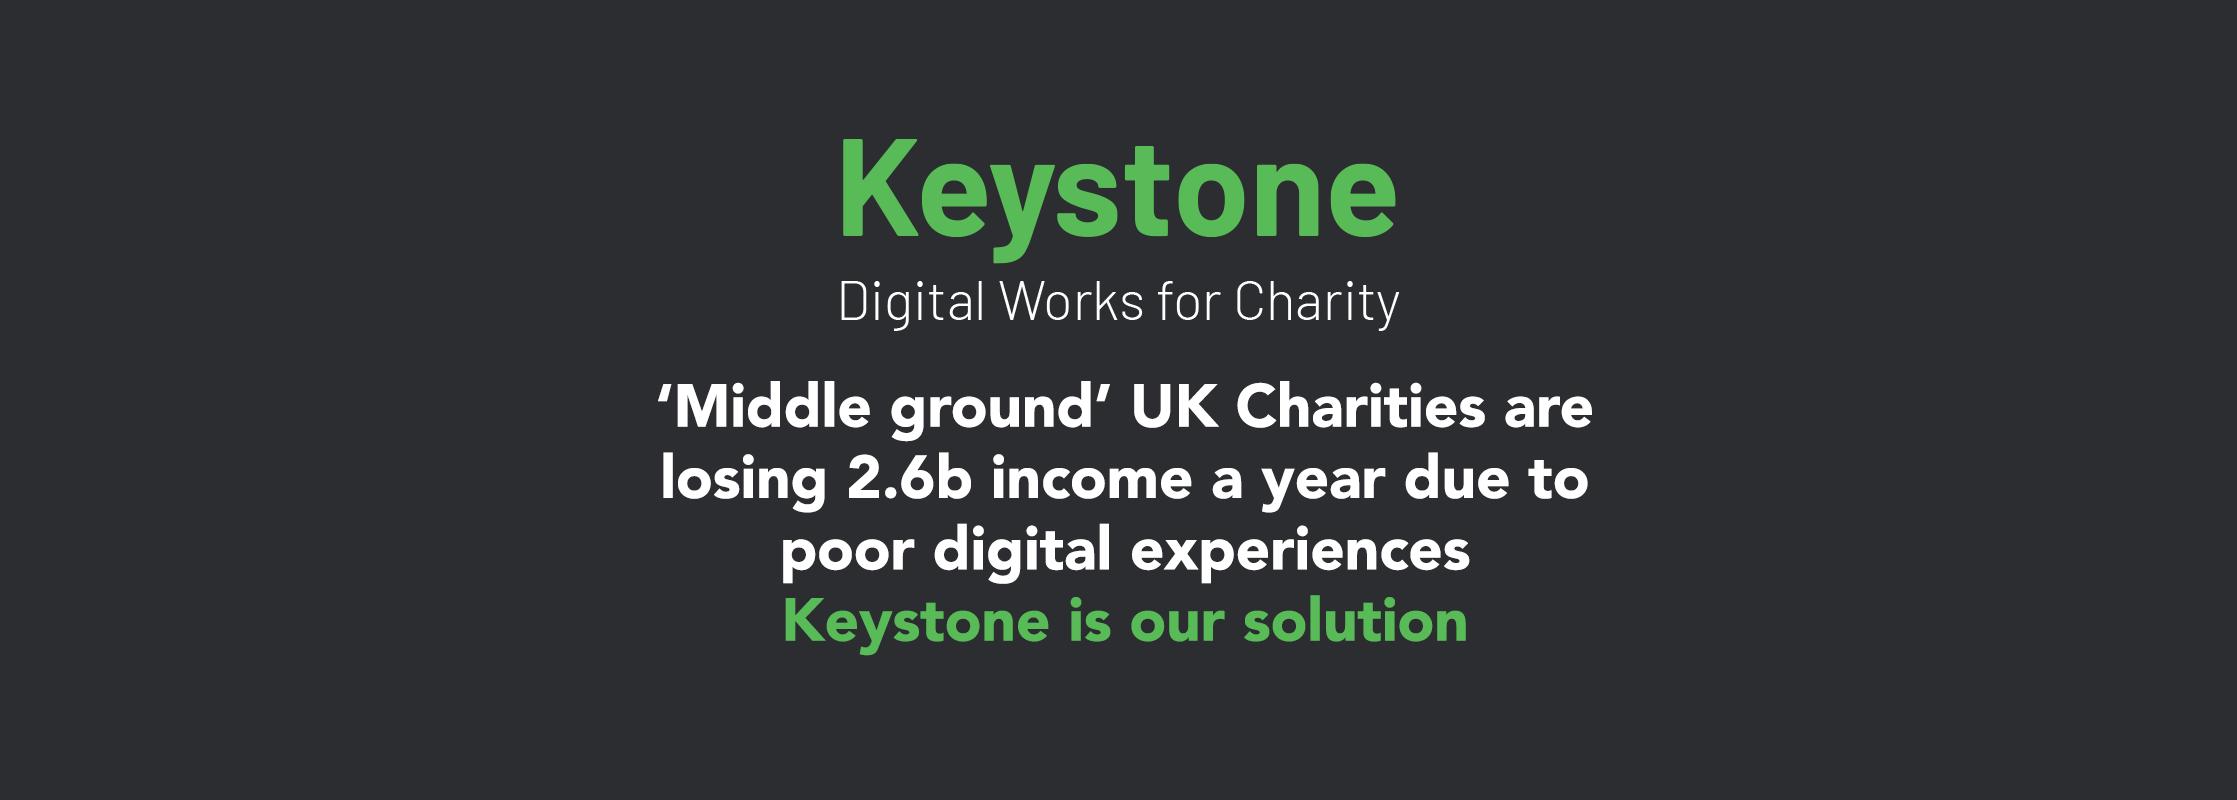 Keystone – Digital Works for Charity - hero image